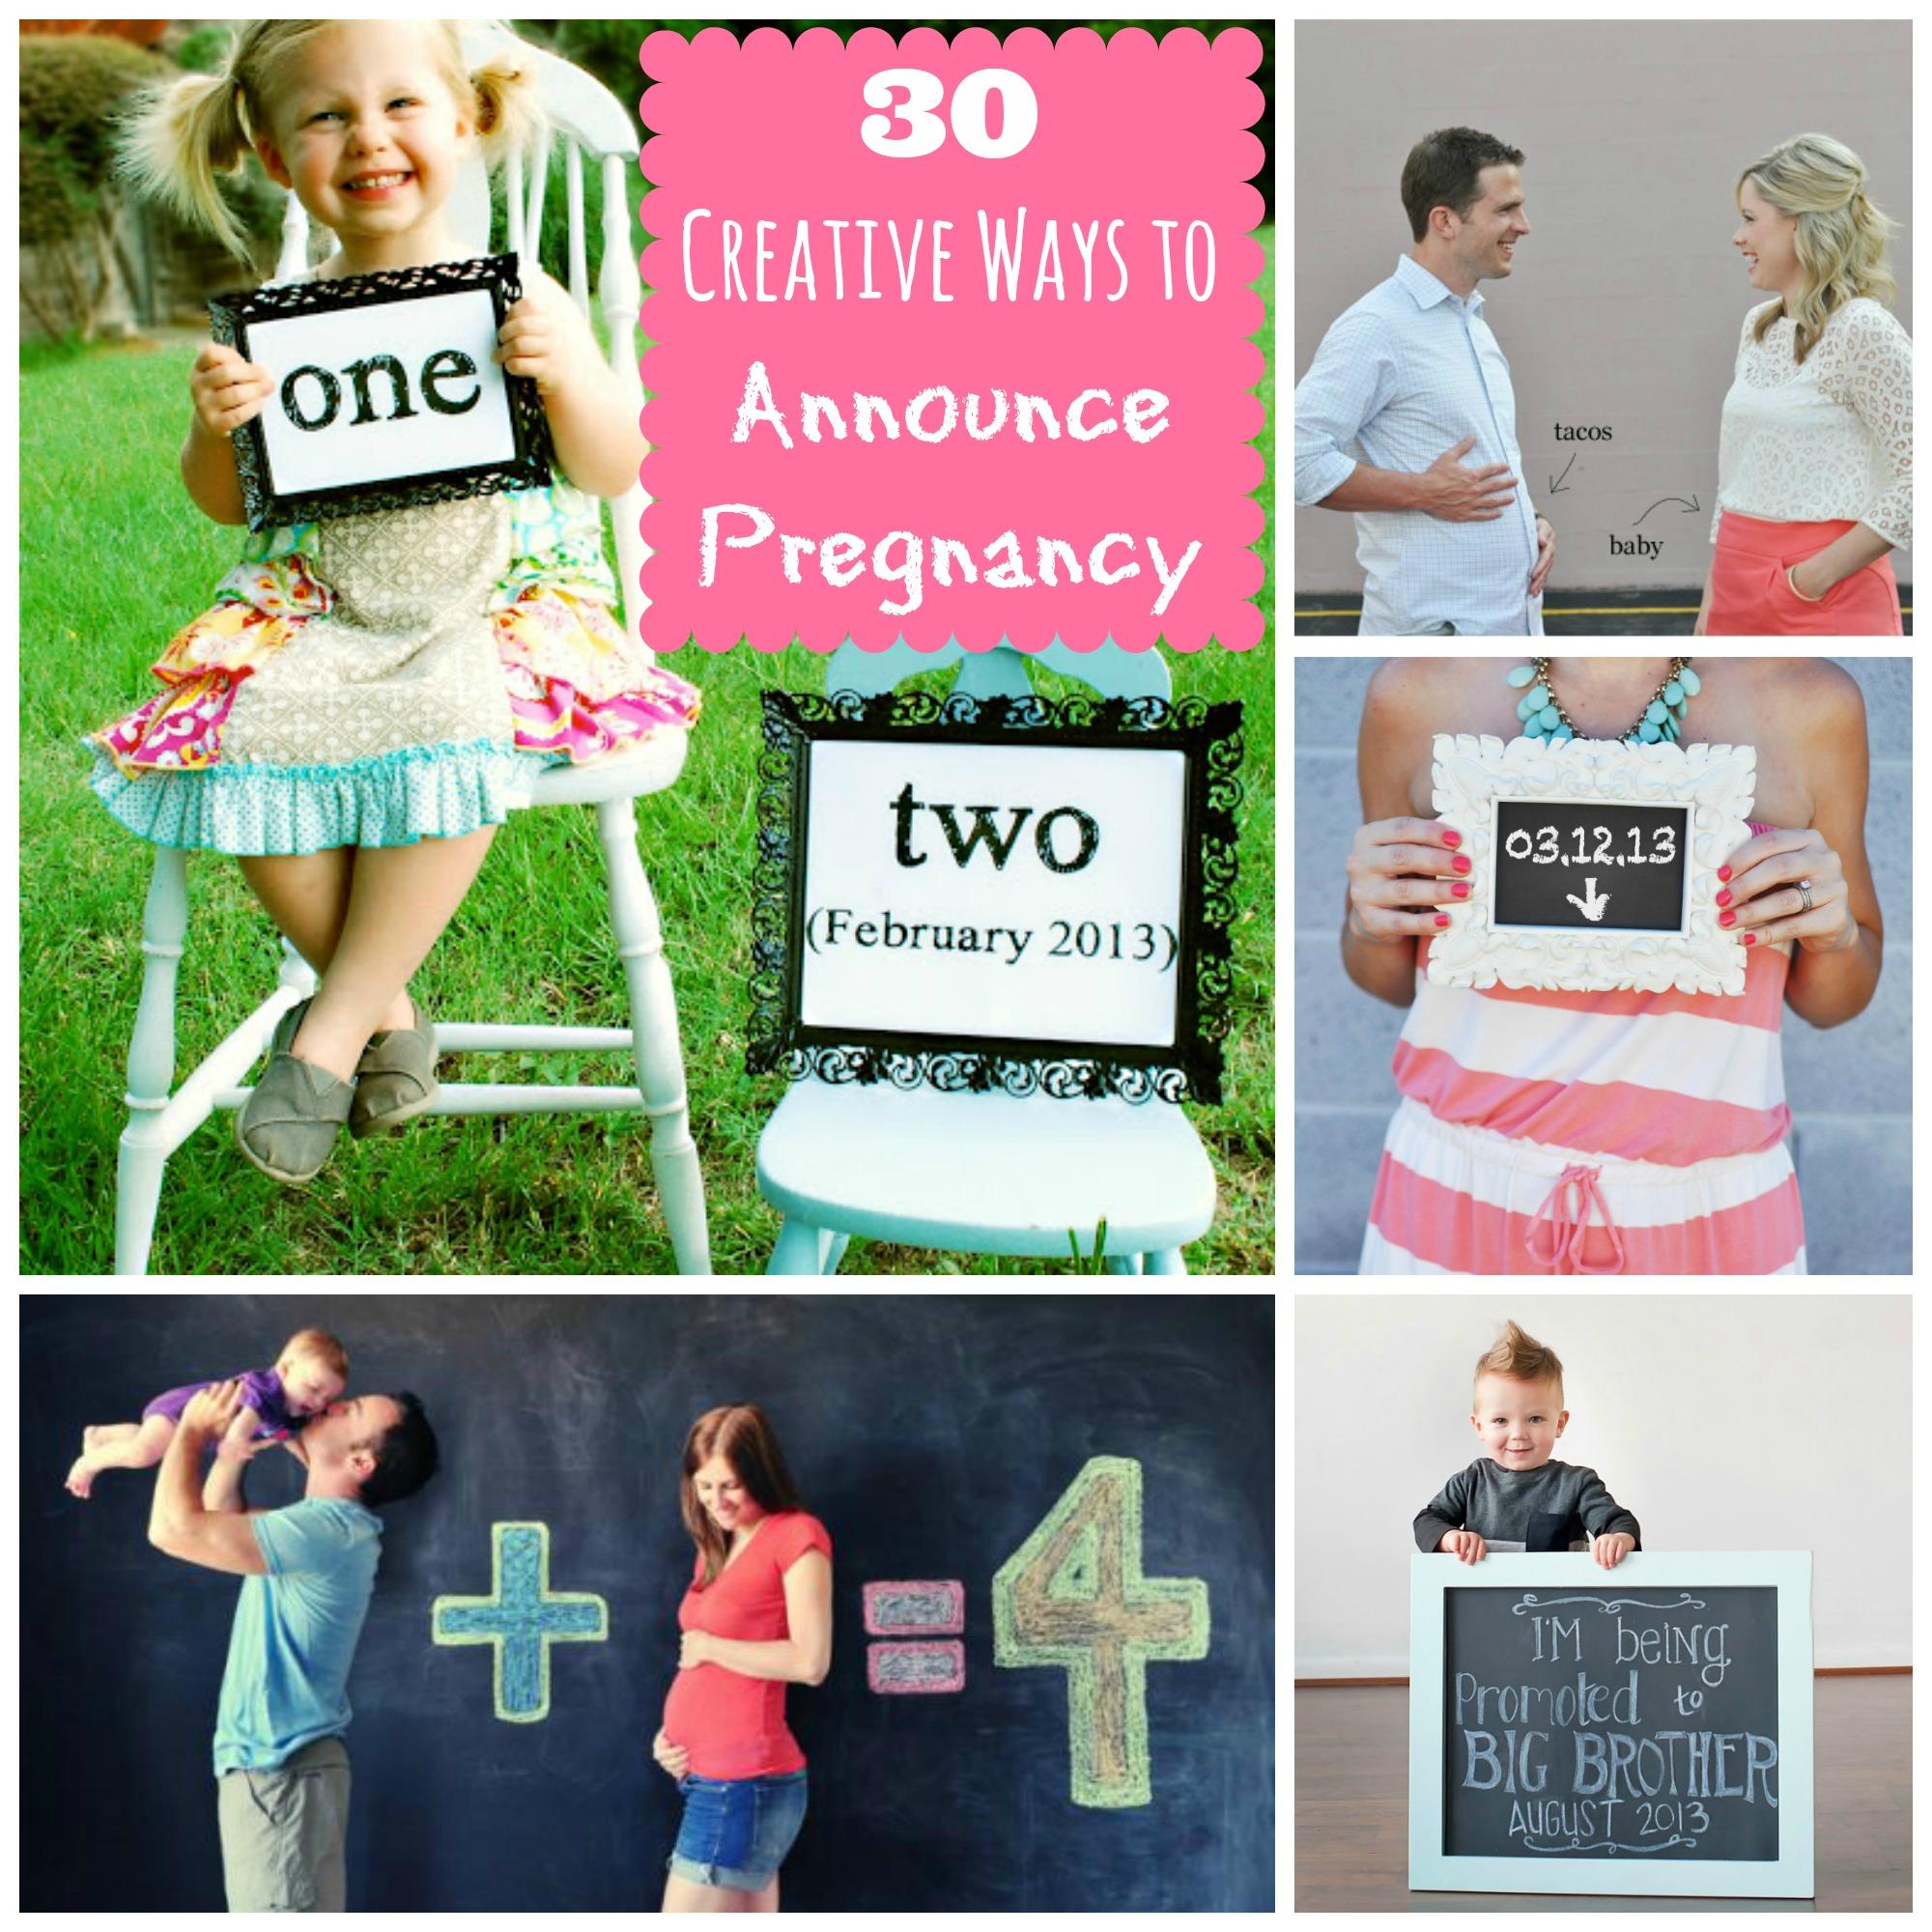 2faf49dfef17a 30 Creative Ways to Announce Pregnancy - Happy Home Fairy